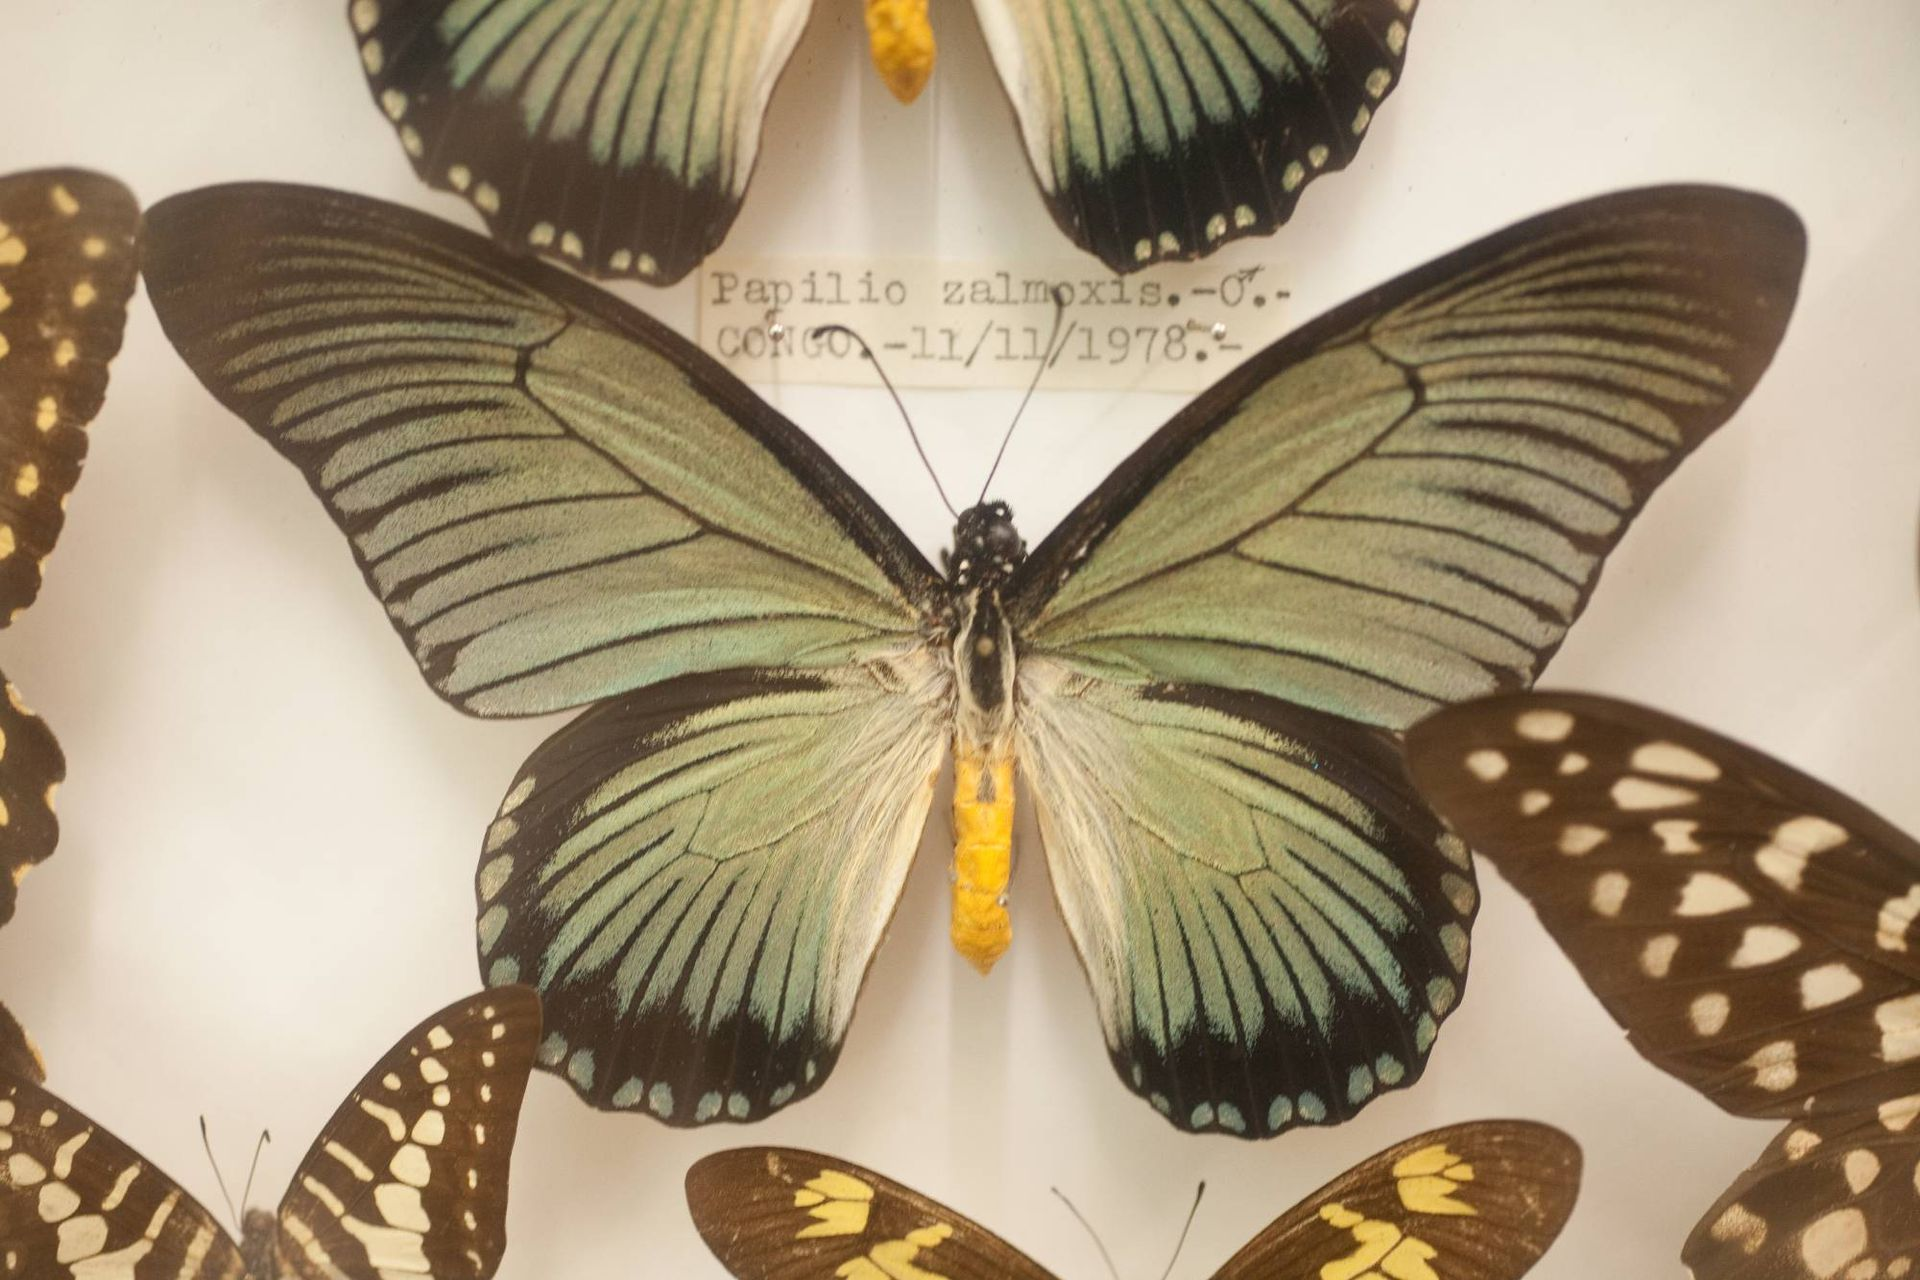 Ejemplares de belleza absoluta se exhiben en Butterflies.